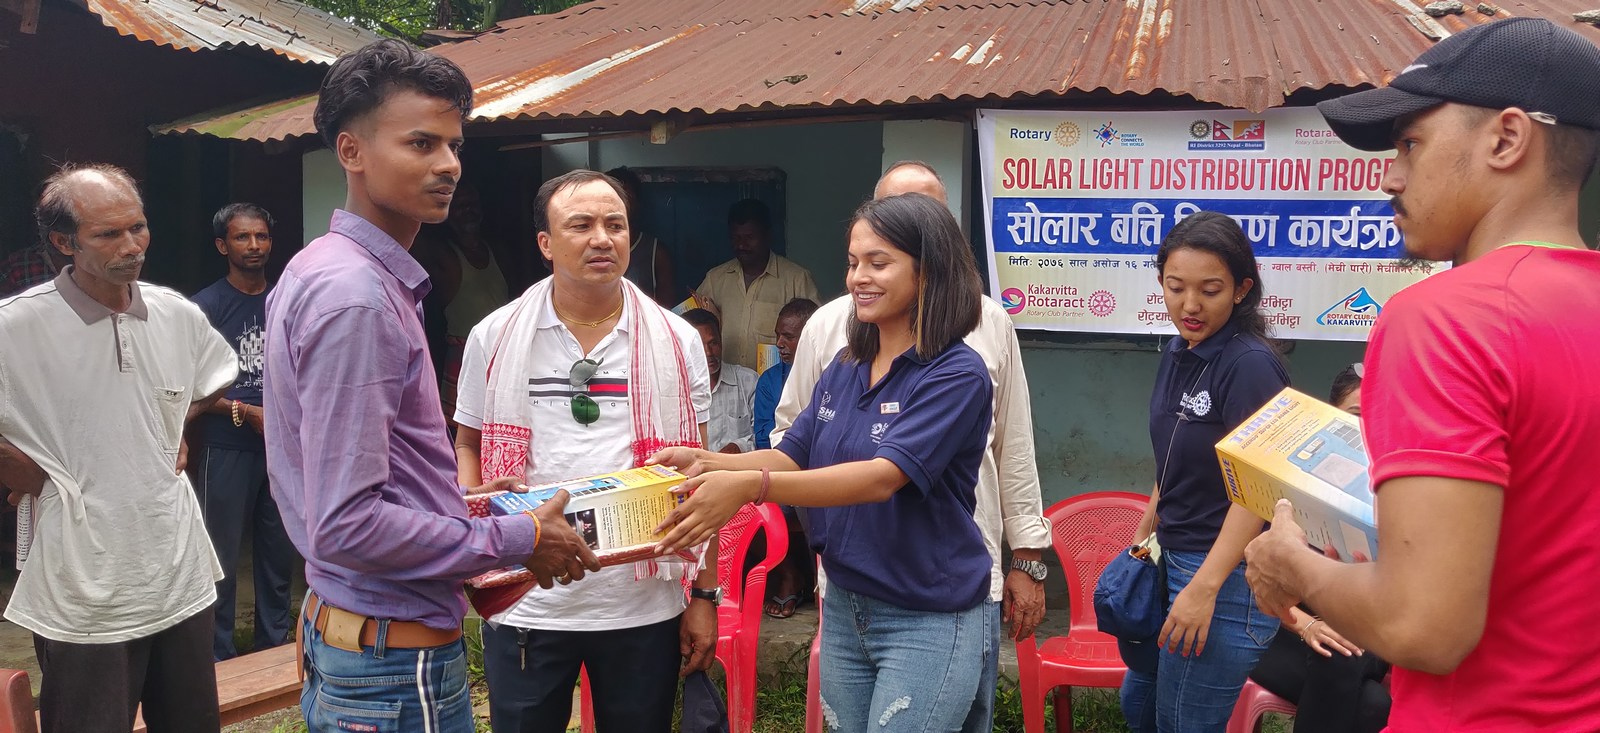 Solar-Light-Distribution-Program-Rotary-Club-of-Kakarvitta-21